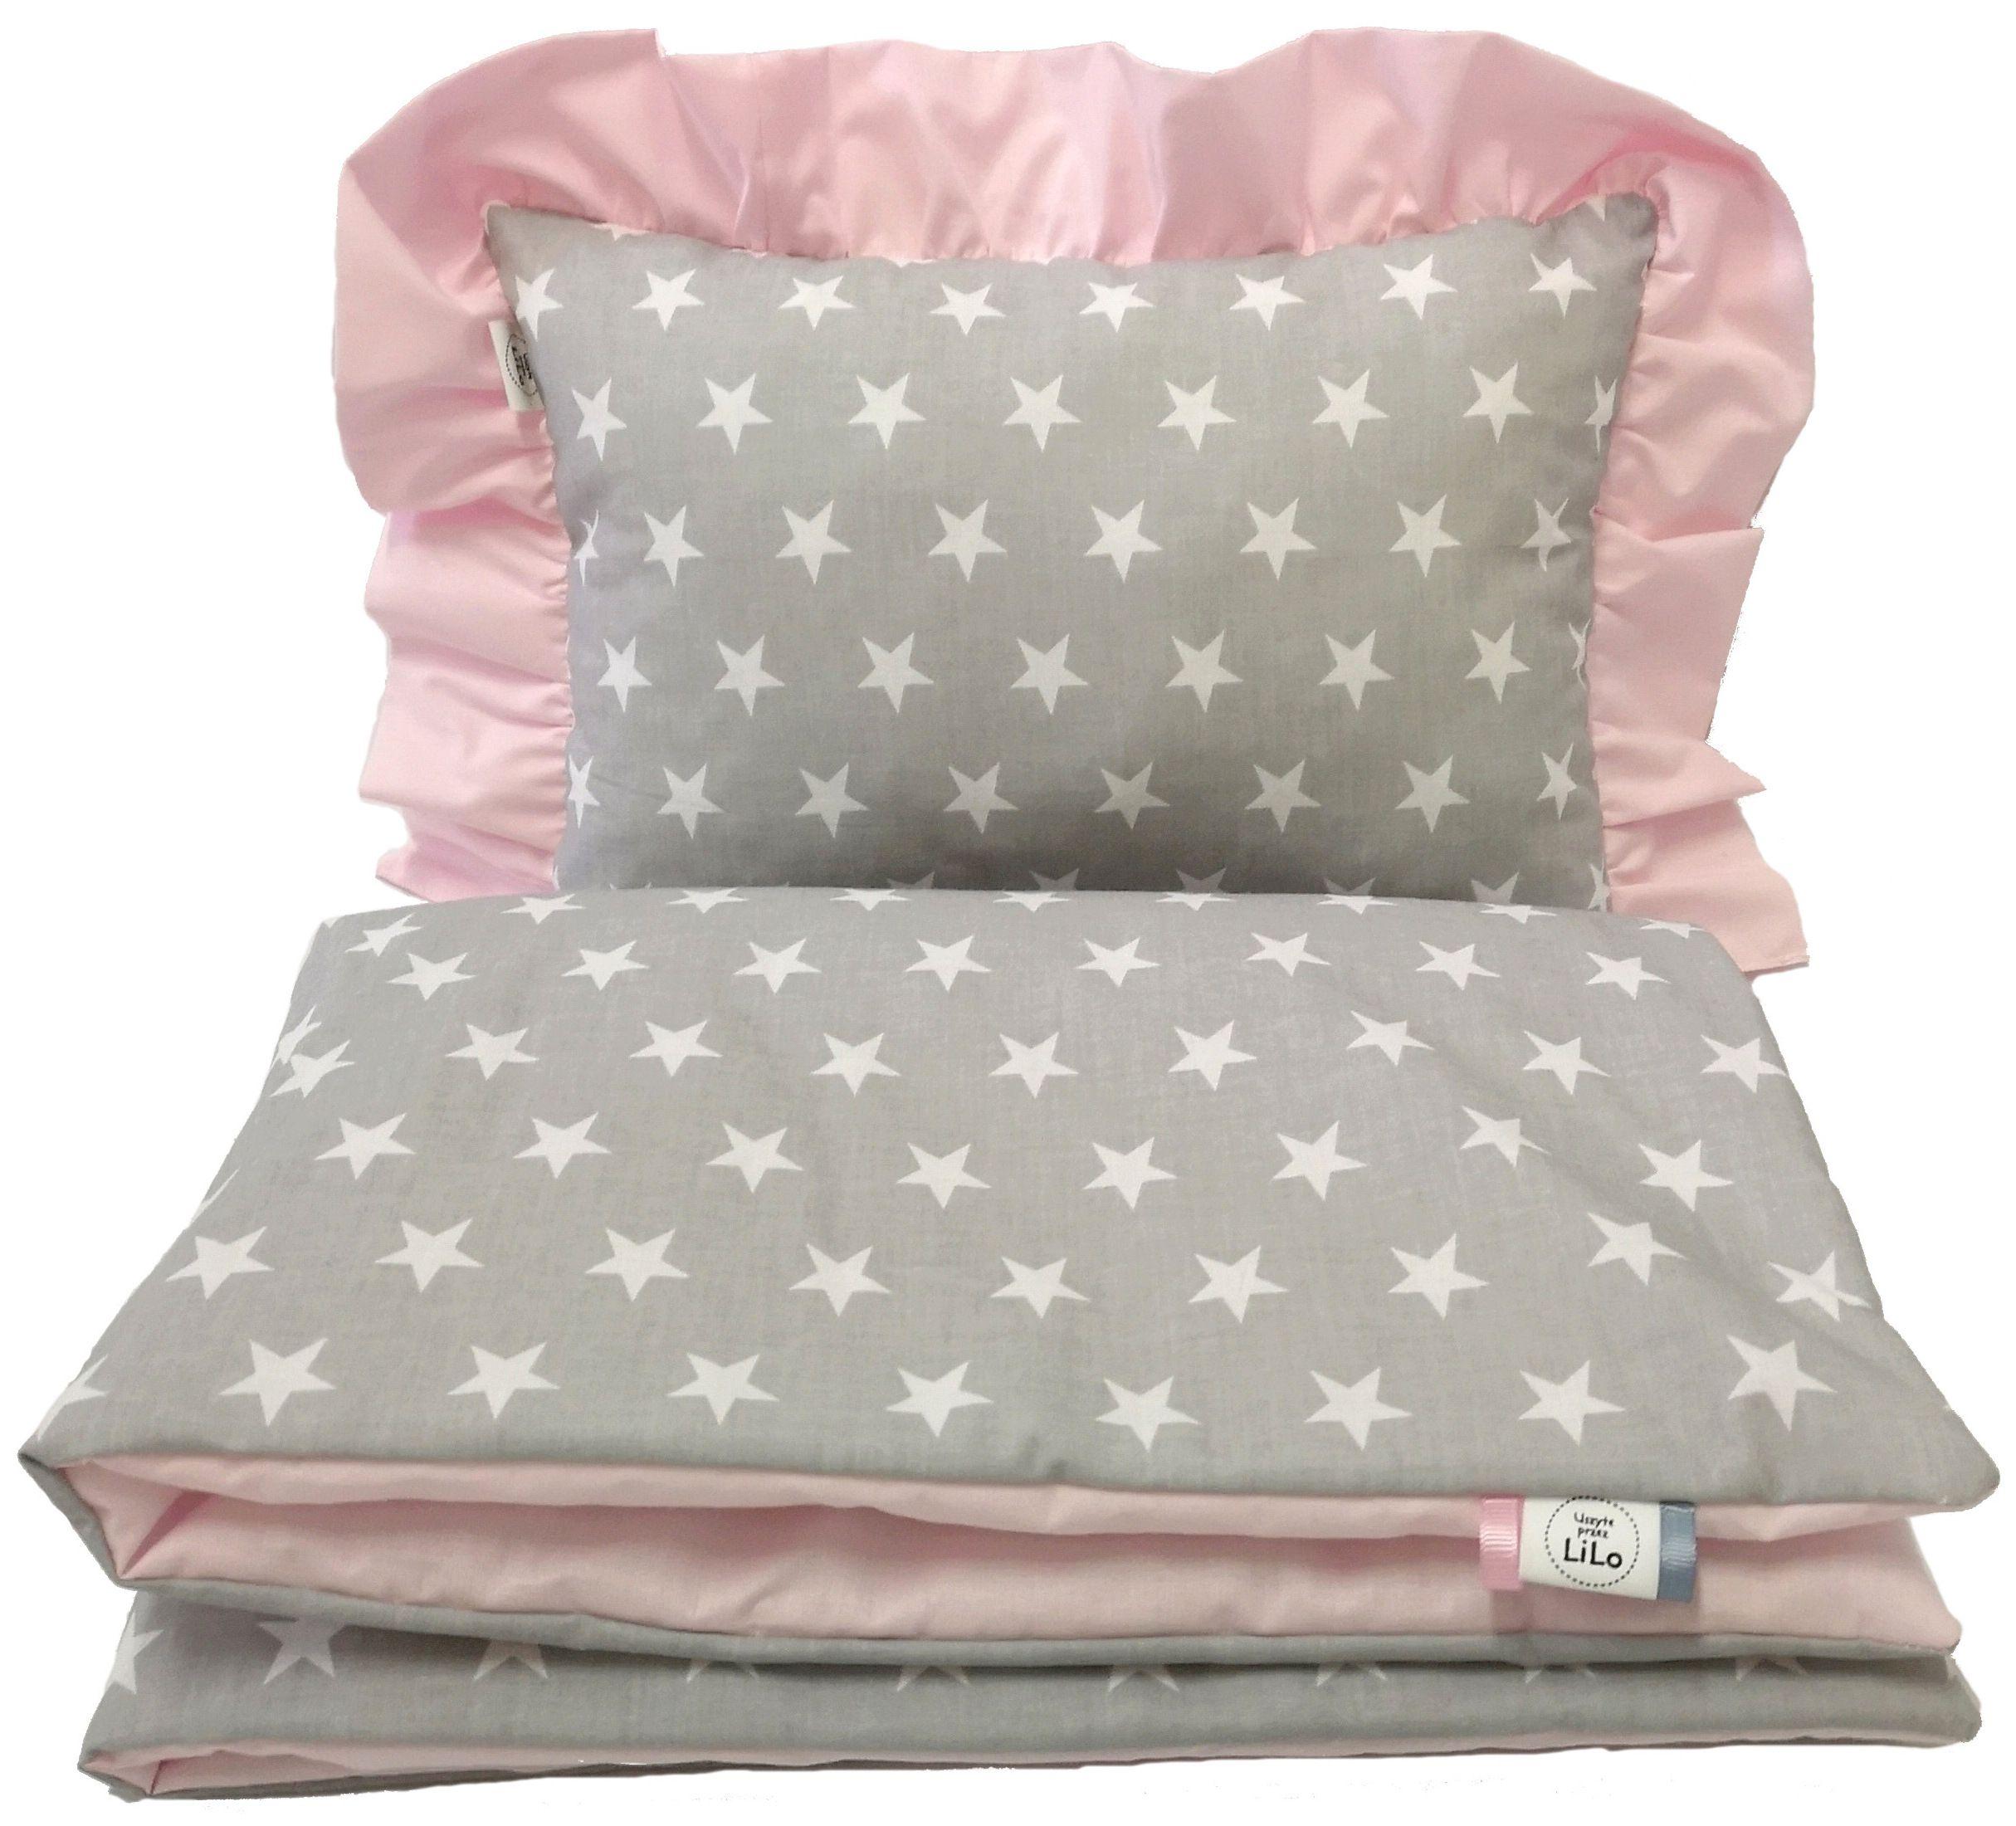 Lilo Posciel Z Falbanka Do Wozka Bawelna D Wzorow Bed Pillows Pillows Bed